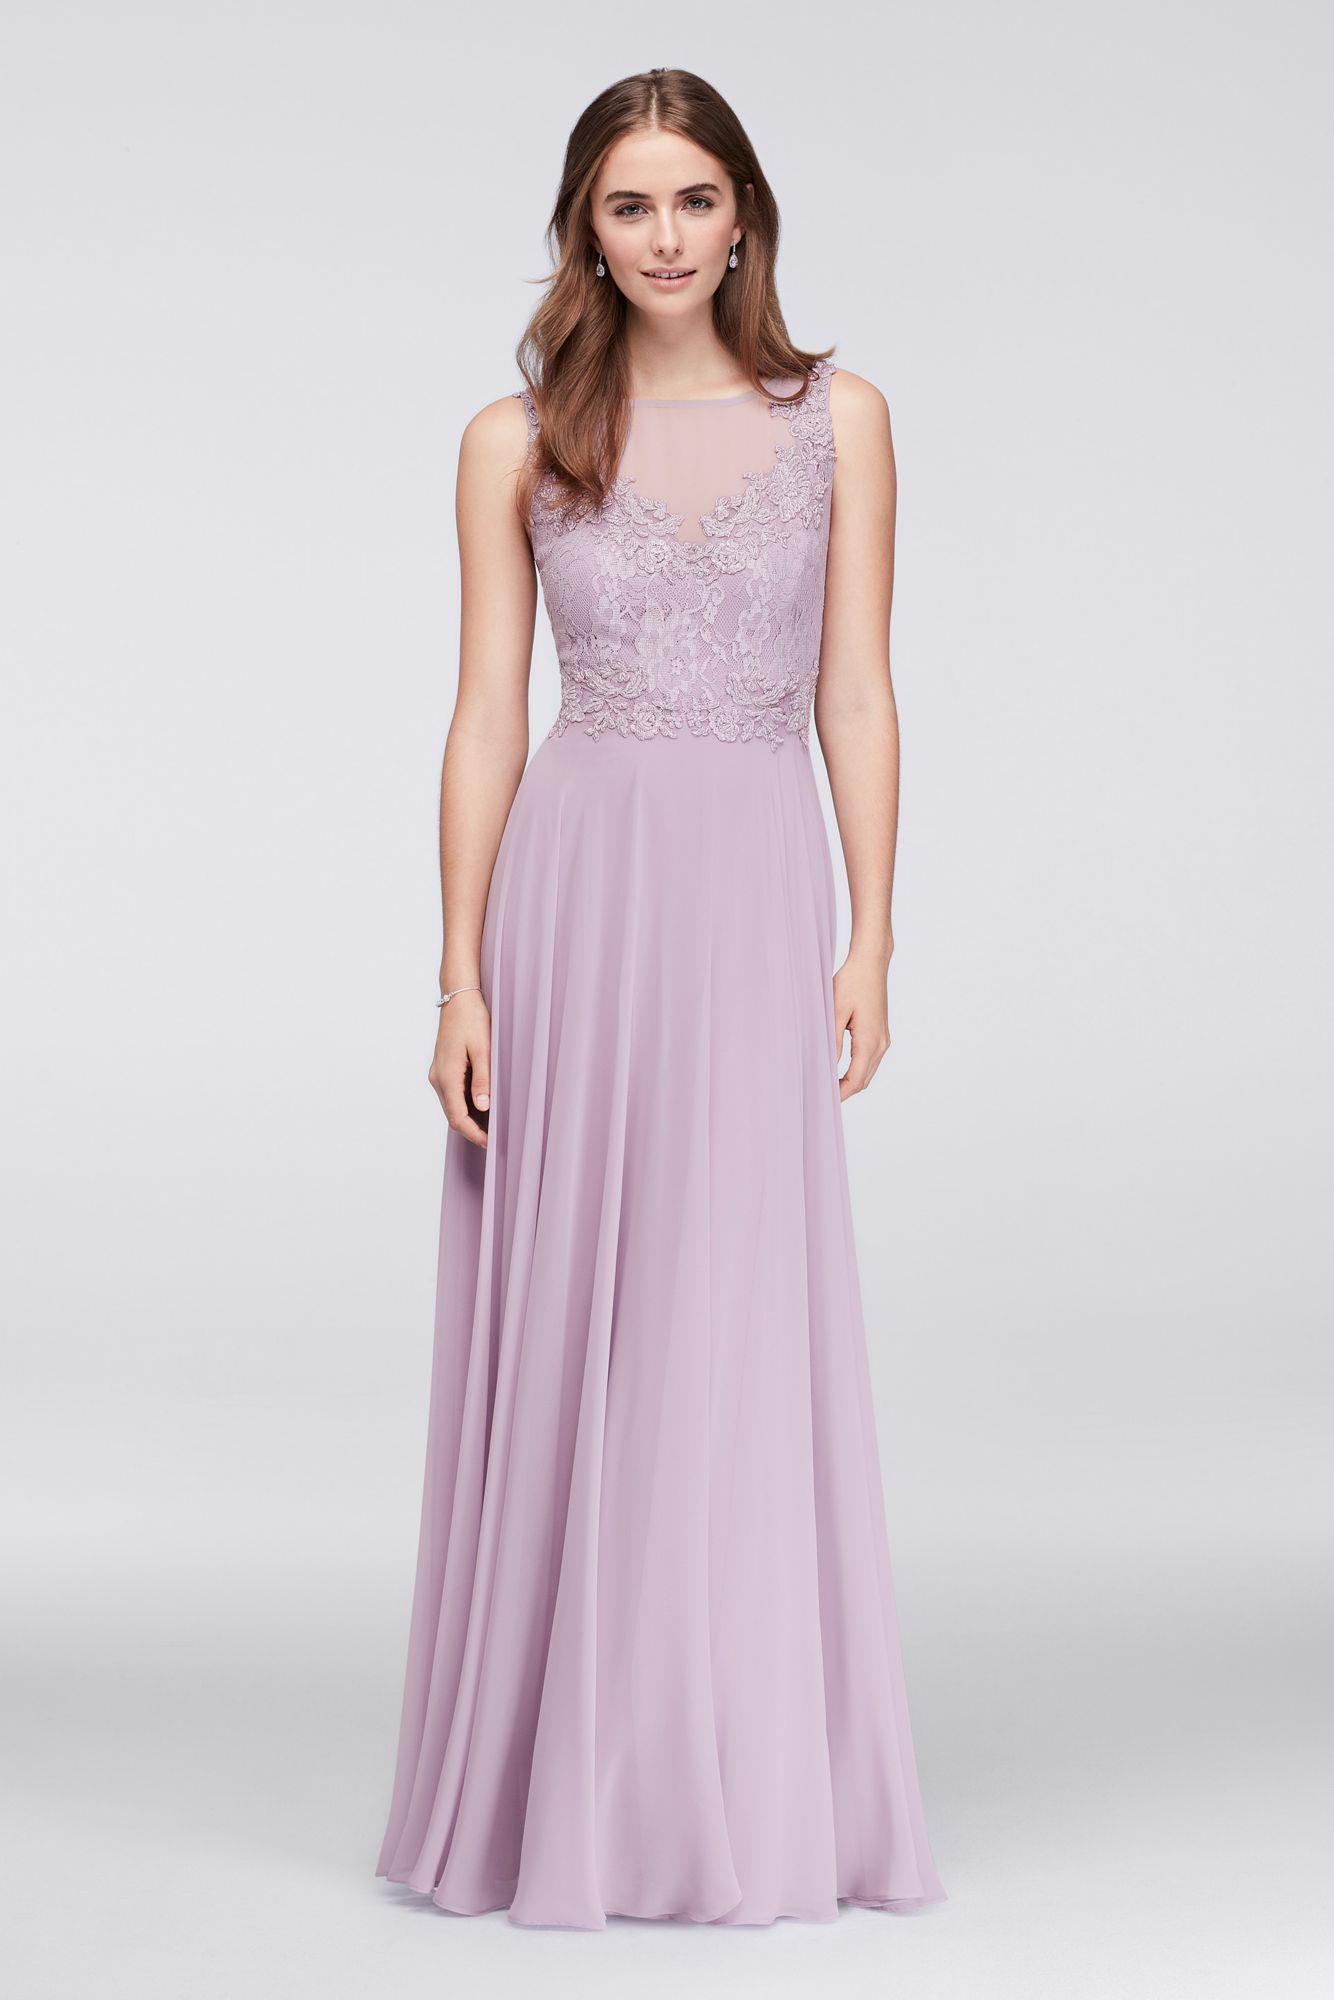 Long A-line Illusion Lace and Chiffon DBBAU449 Dress for Bridesmaids ... 22e1cfdf739b